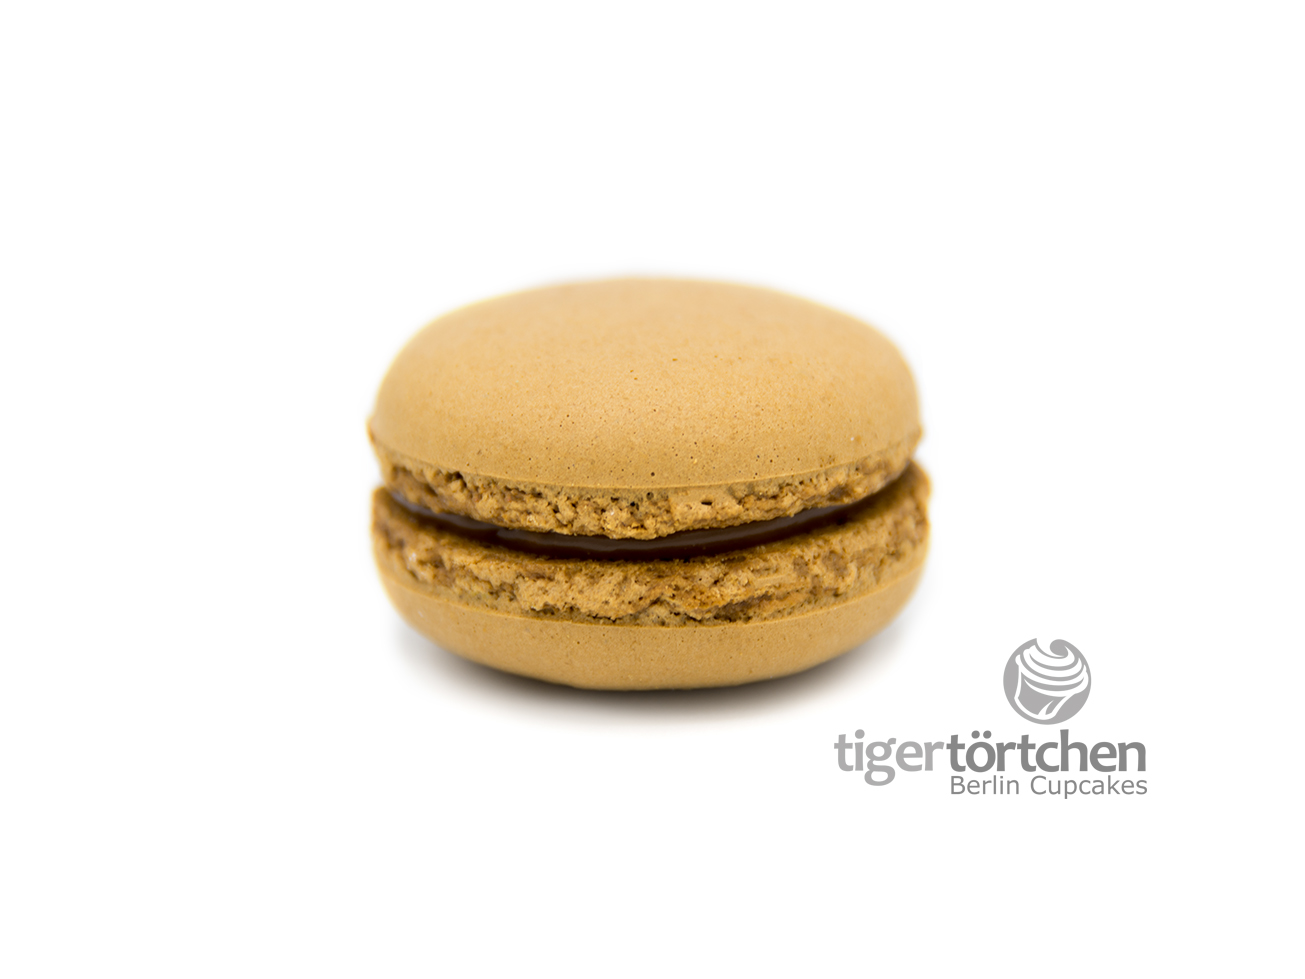 Macaron Salty-Caramel tigertörtchen Berlin